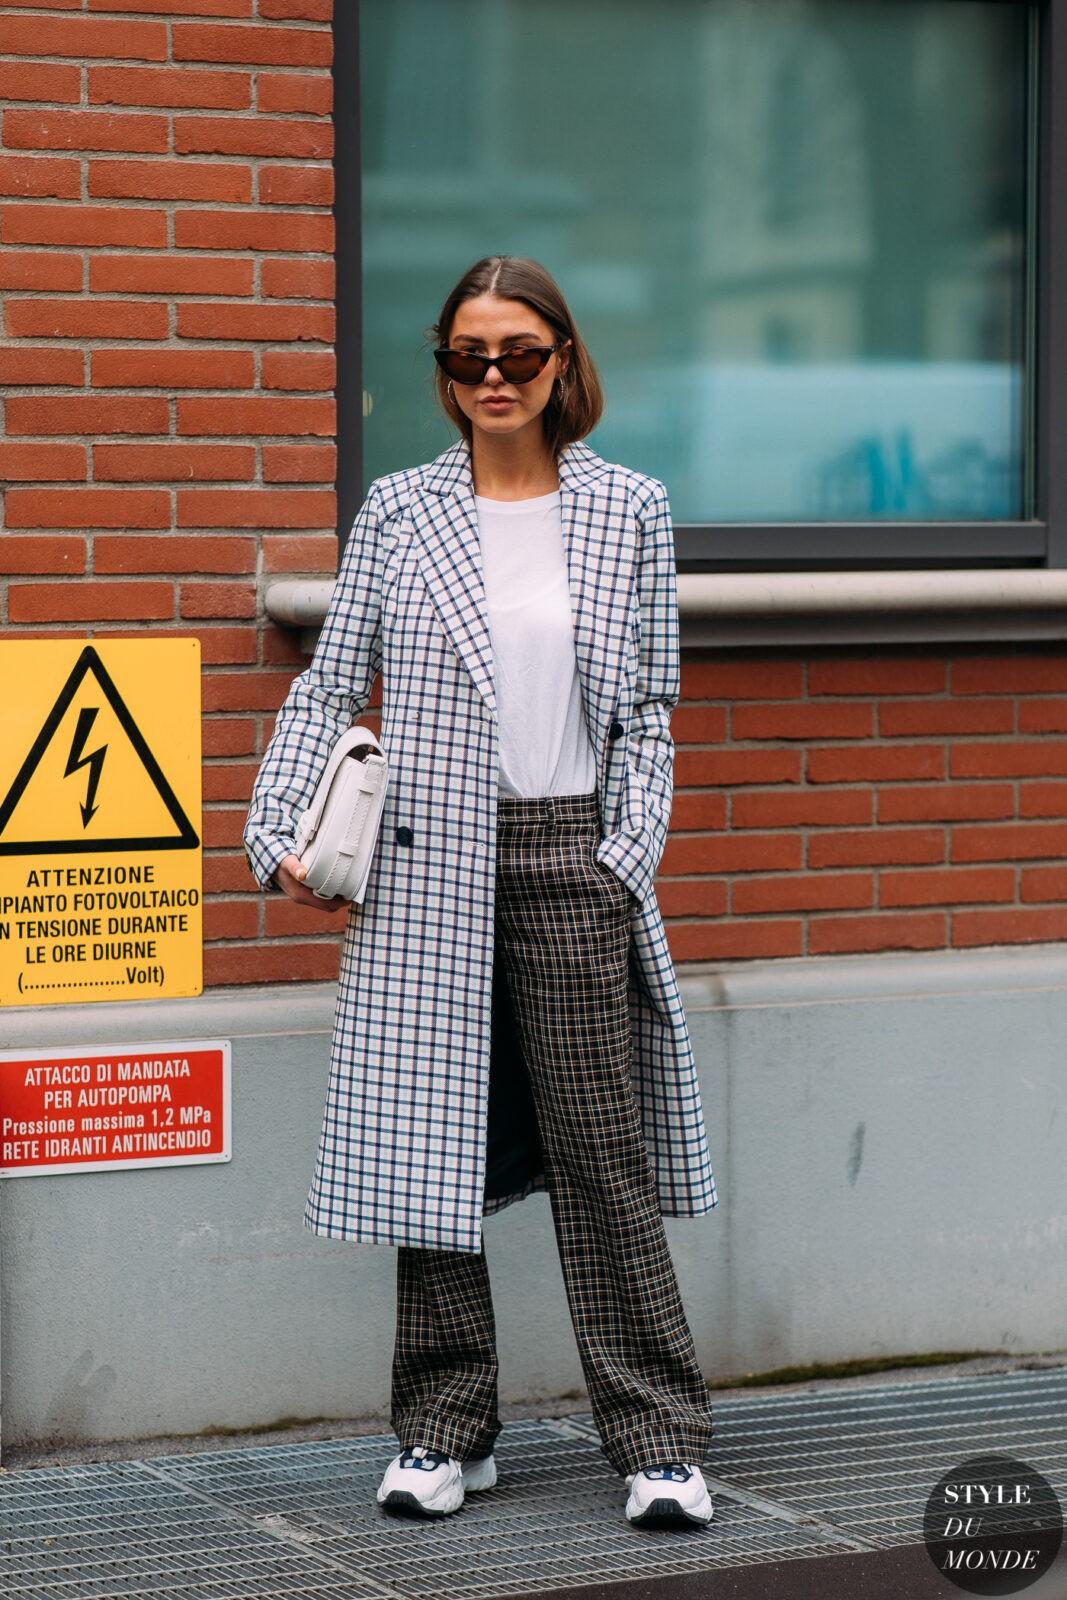 stylebook print on print trend toronto 2018 edit seven